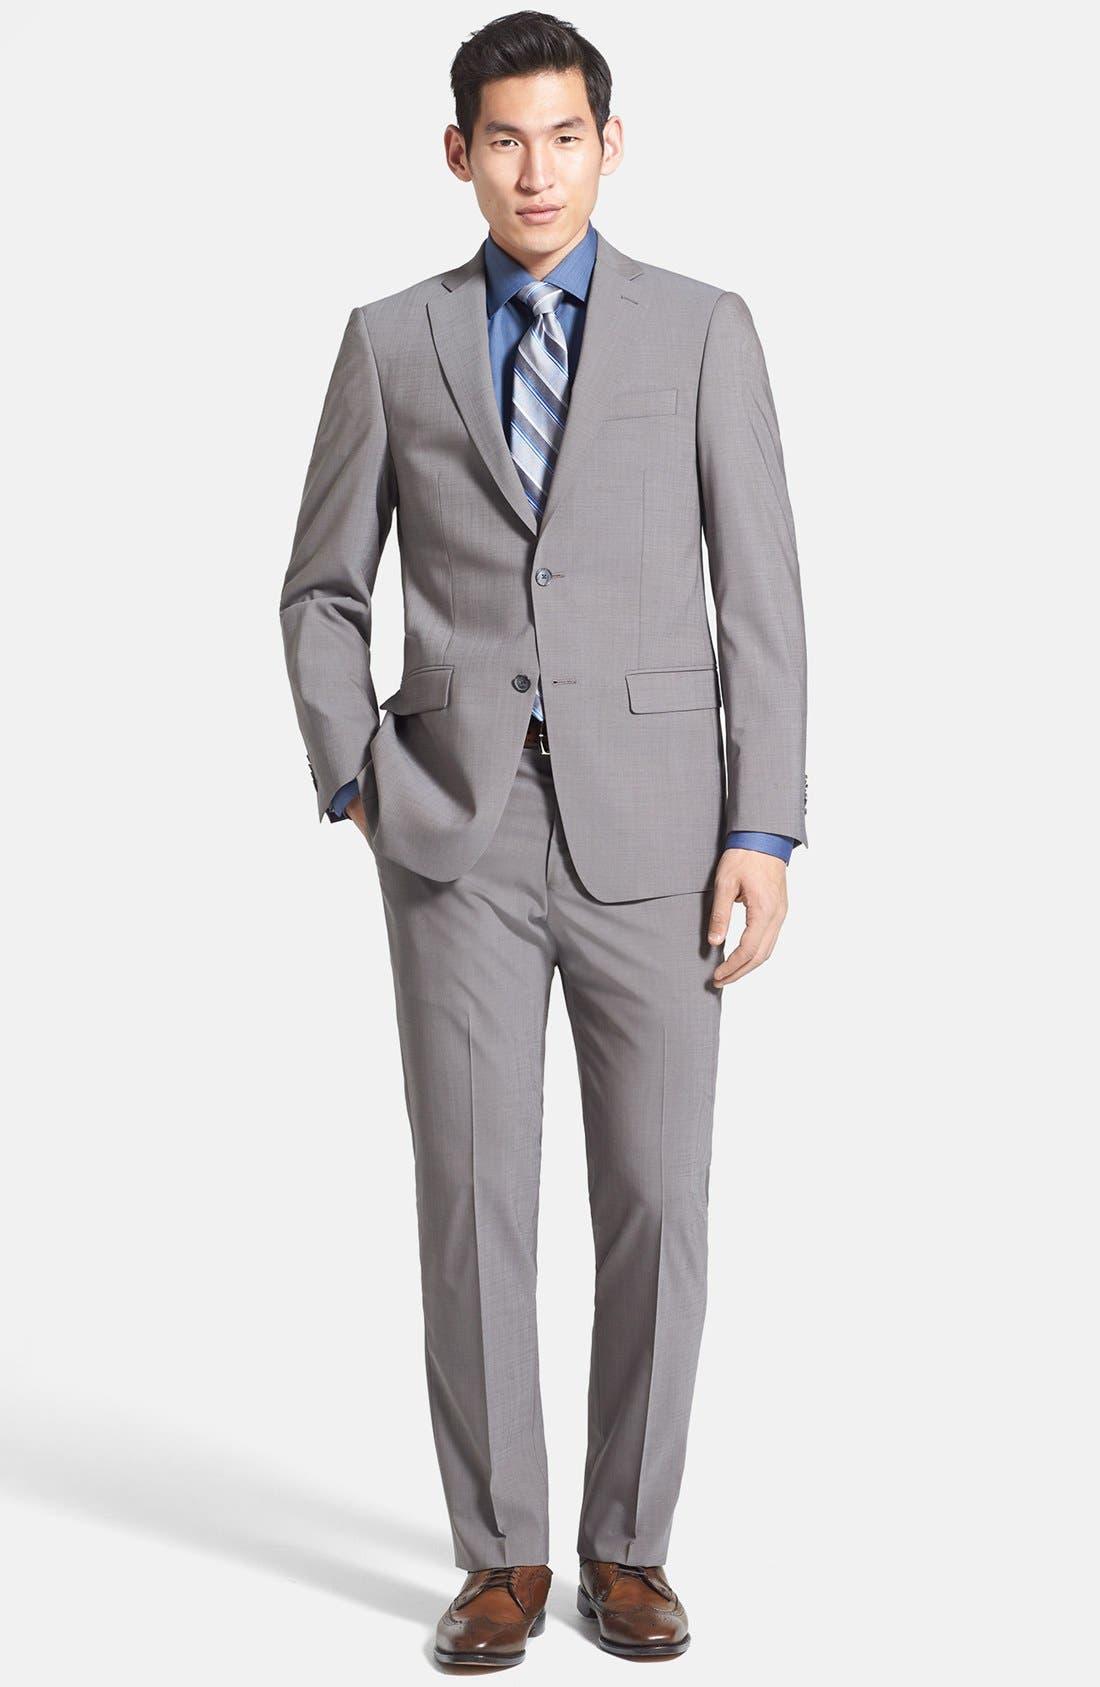 Main Image - Michael Kors Trim Fit Stretch Wool Suit